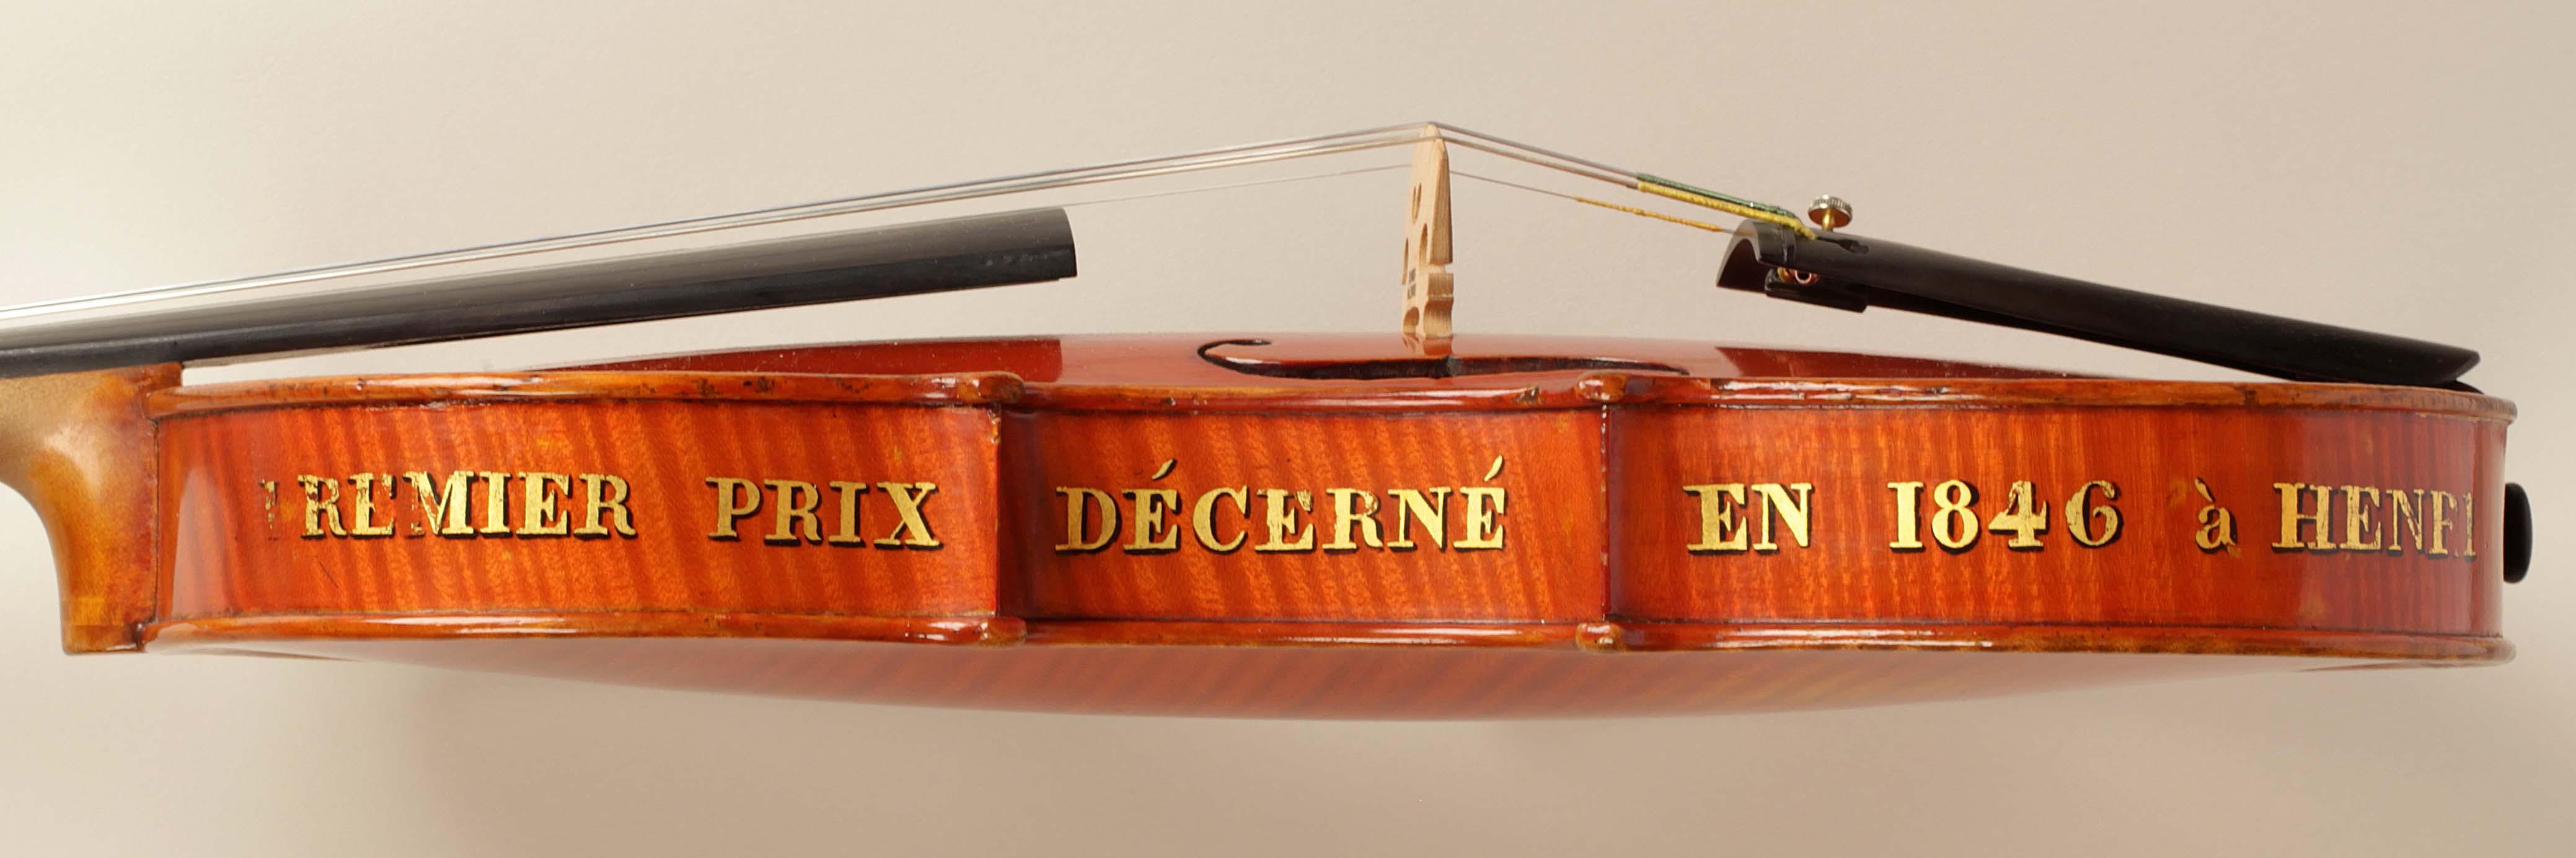 Prezentacja skrzypiec Henryka Wieniawskiego (GAND, Luthier de la Musique du Roi at du Conservatoire de Musique, 1846 r.) na Gali Laureatów Konkursu w dniu 23.10.2016